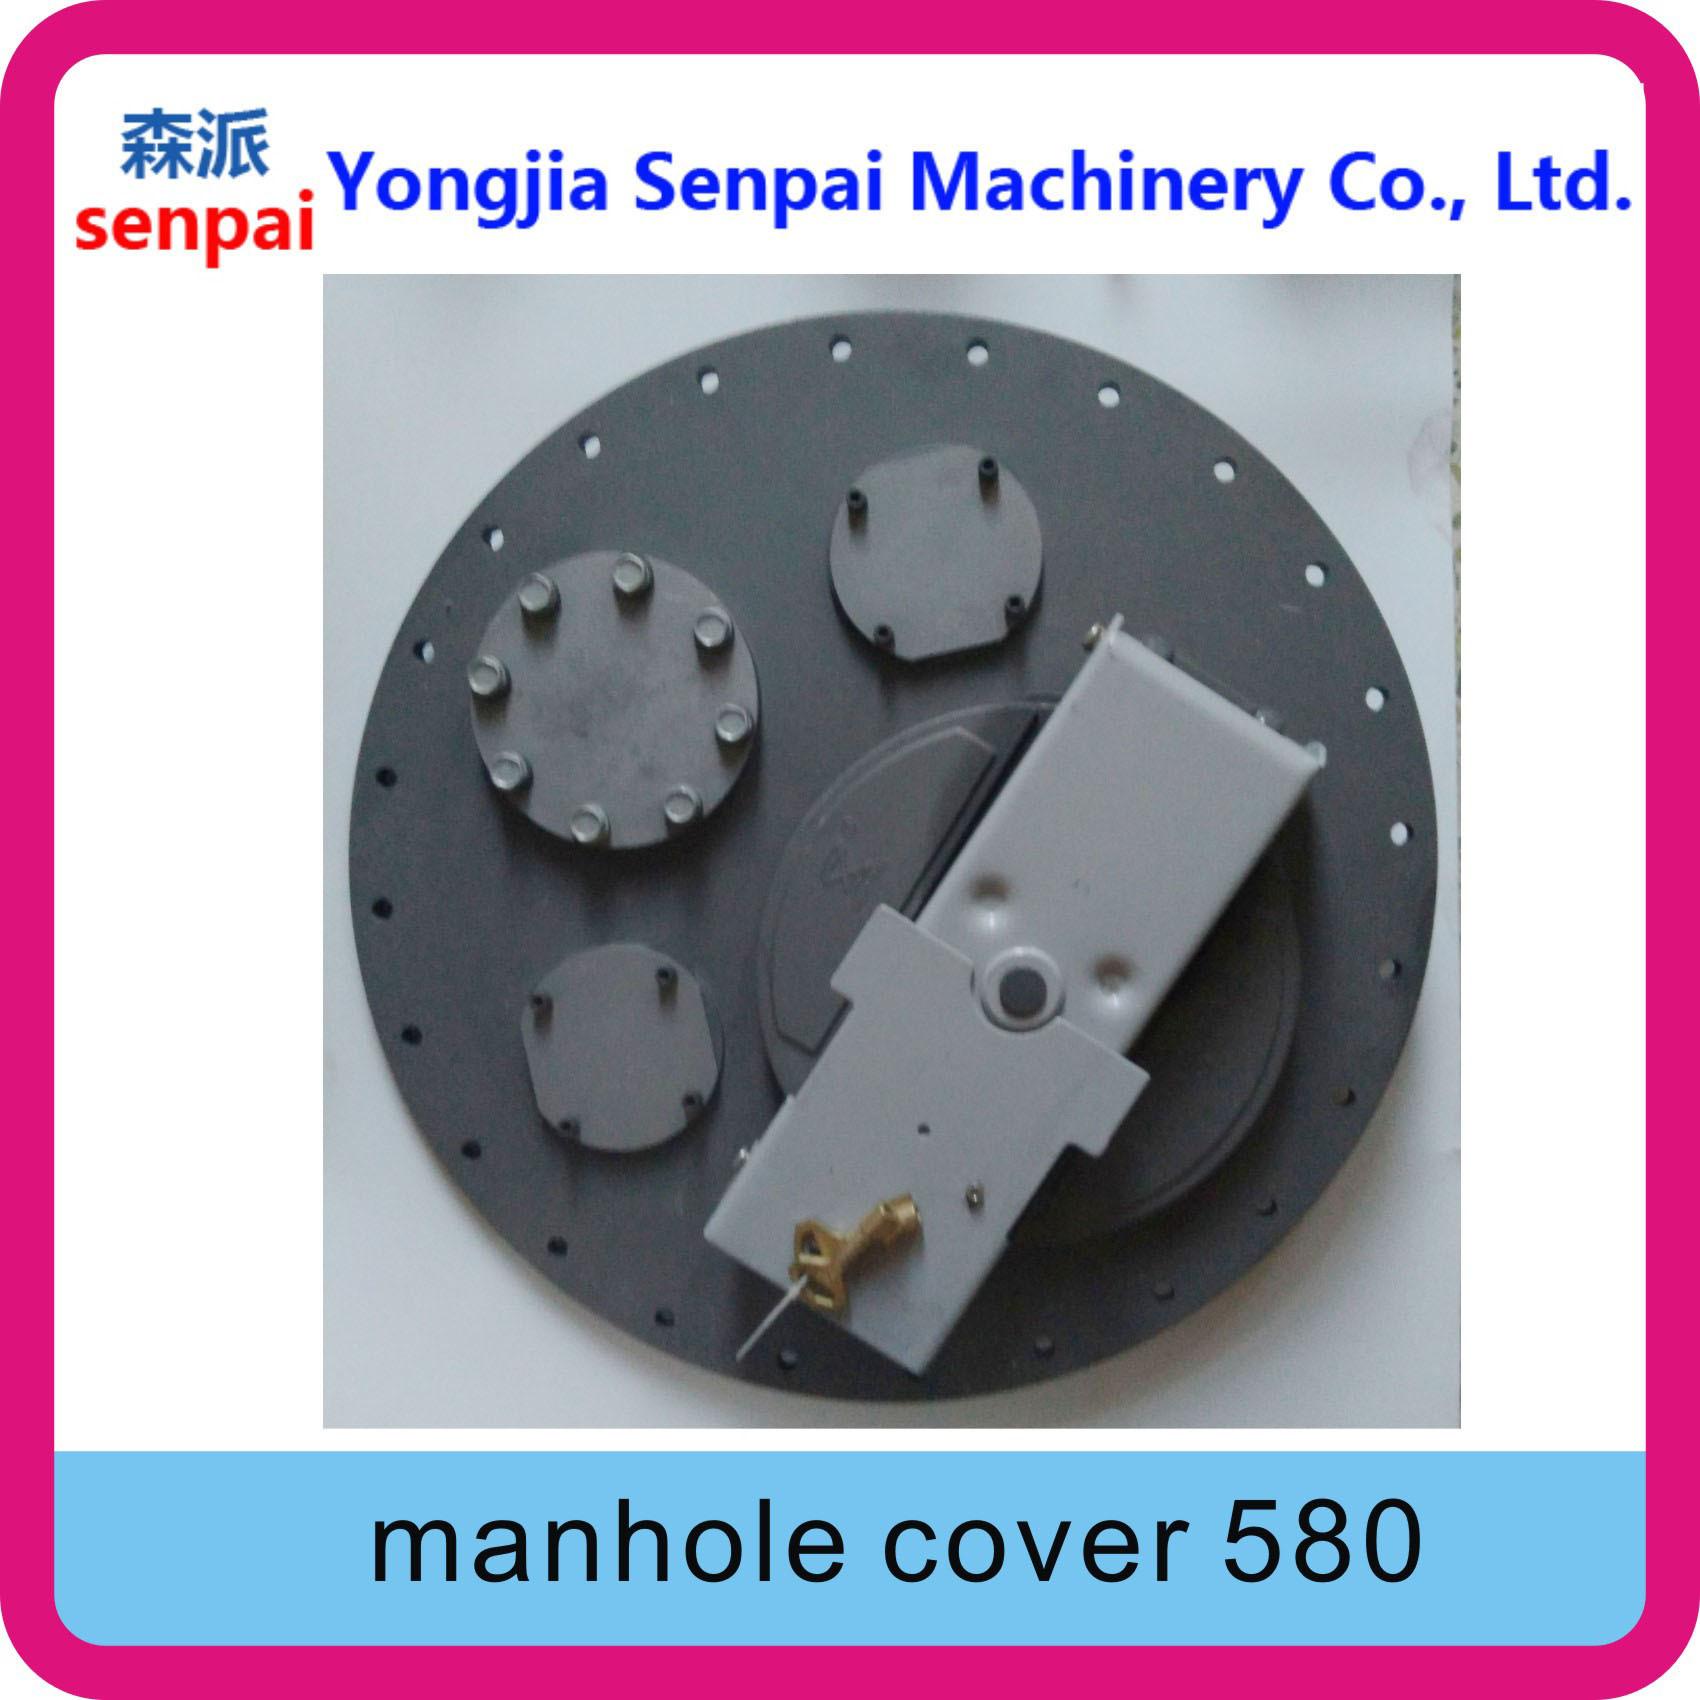 Senpai Machinery Tanker Accessory API 580mm 58cm Alloy Manhole Cover